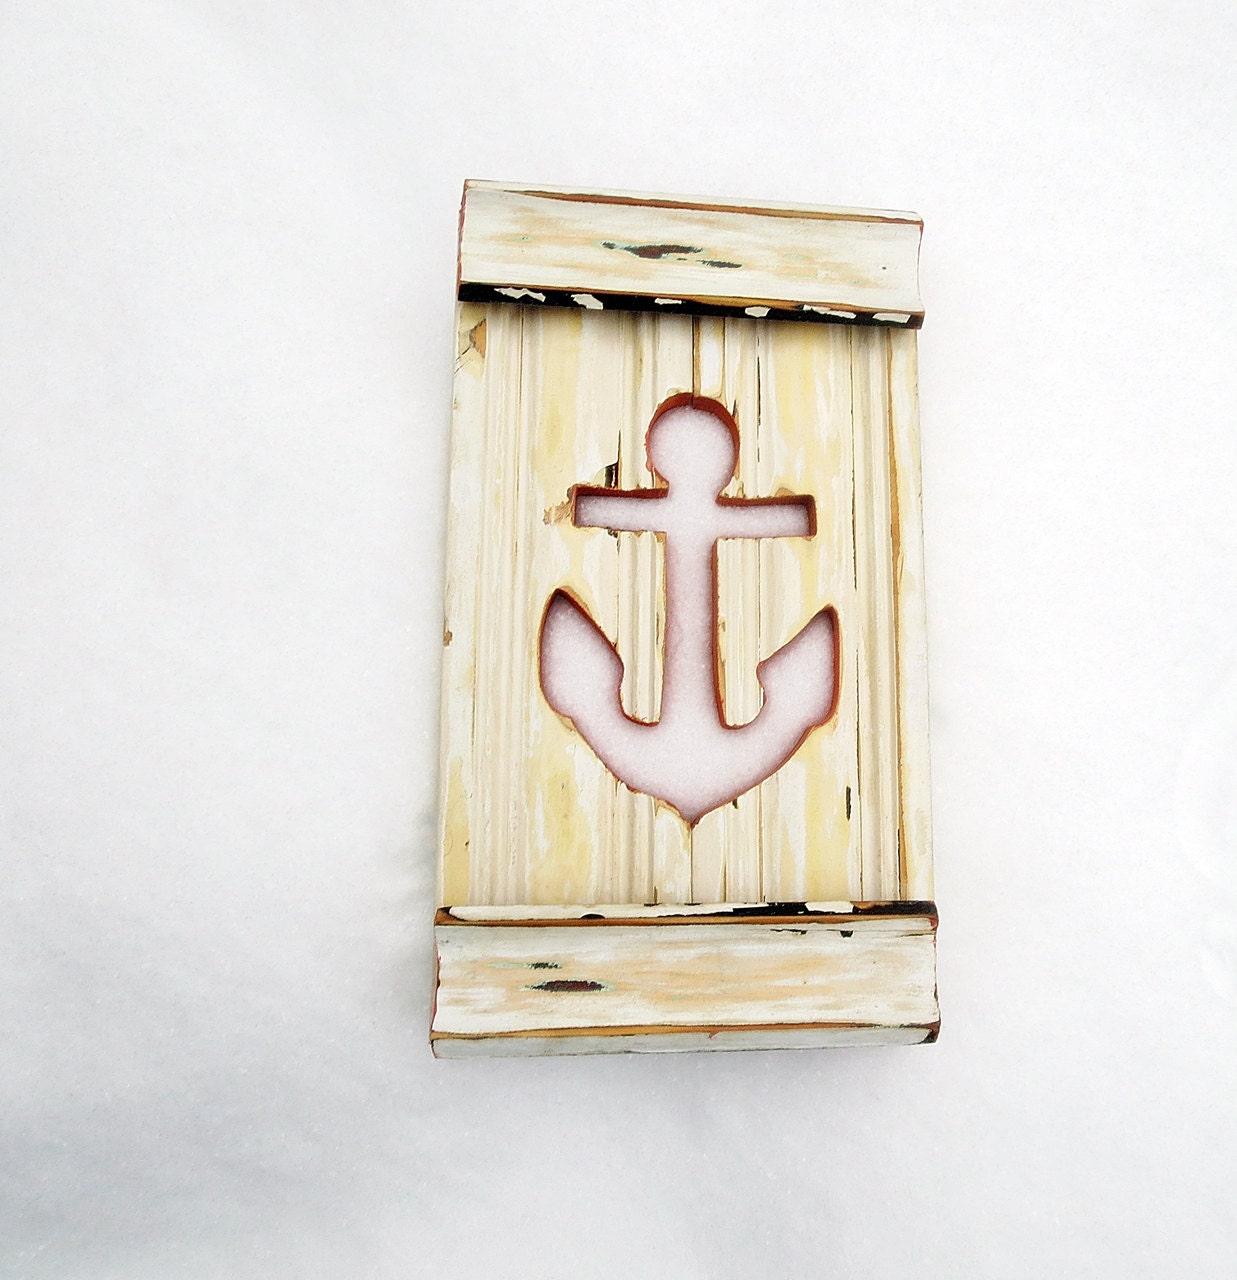 Decorative wooden anchor wall decor : Anchor wall art nautical beach decor reclaimed wood